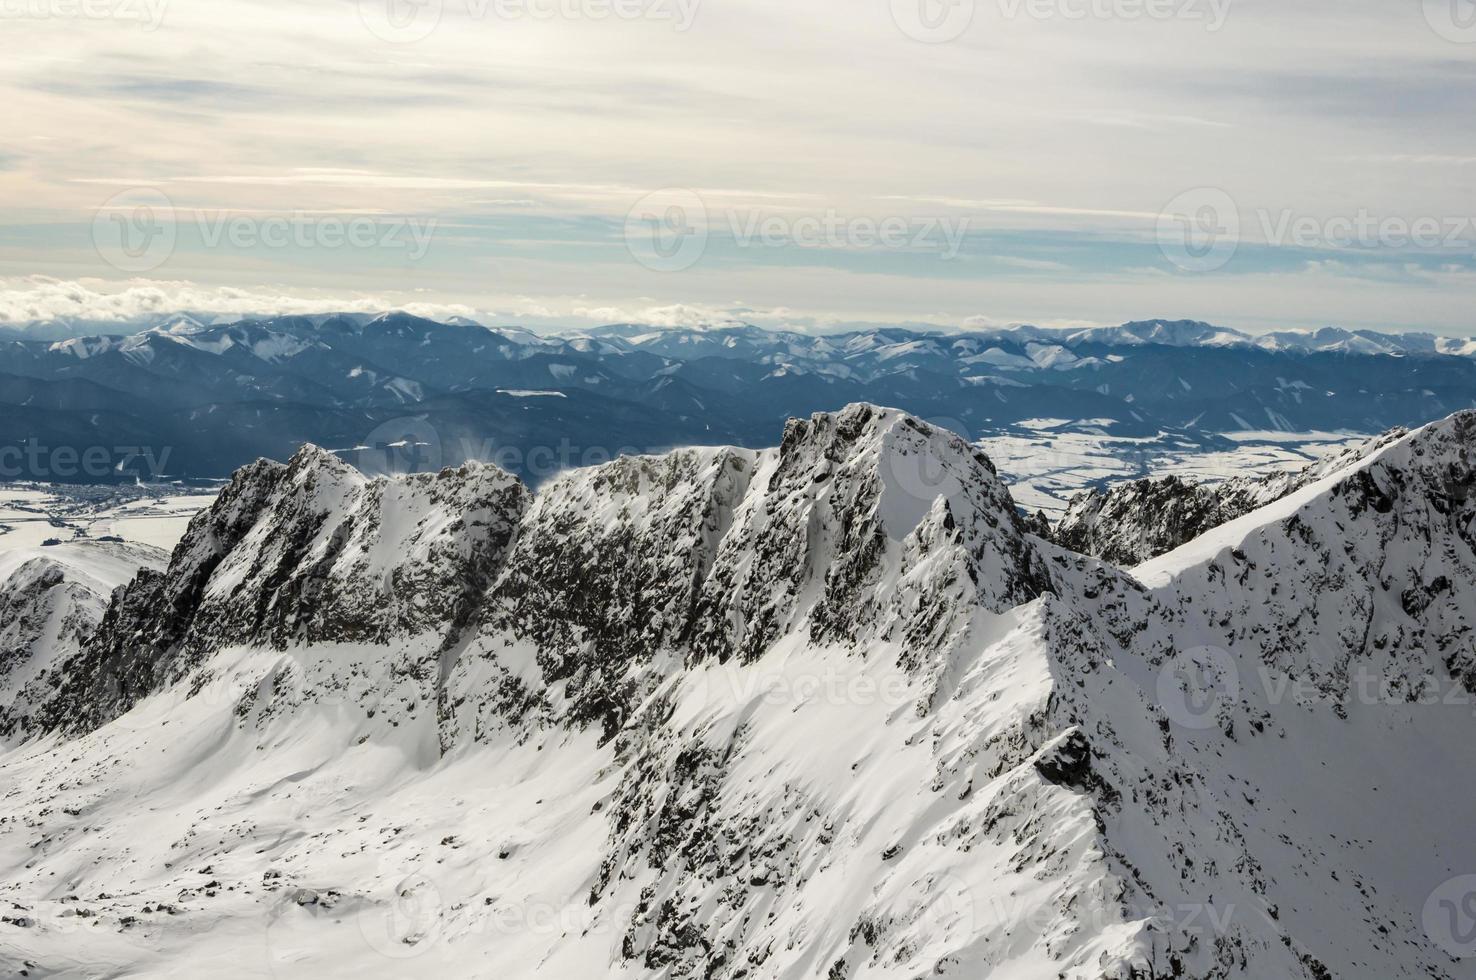 bellissima cresta in inverno foto